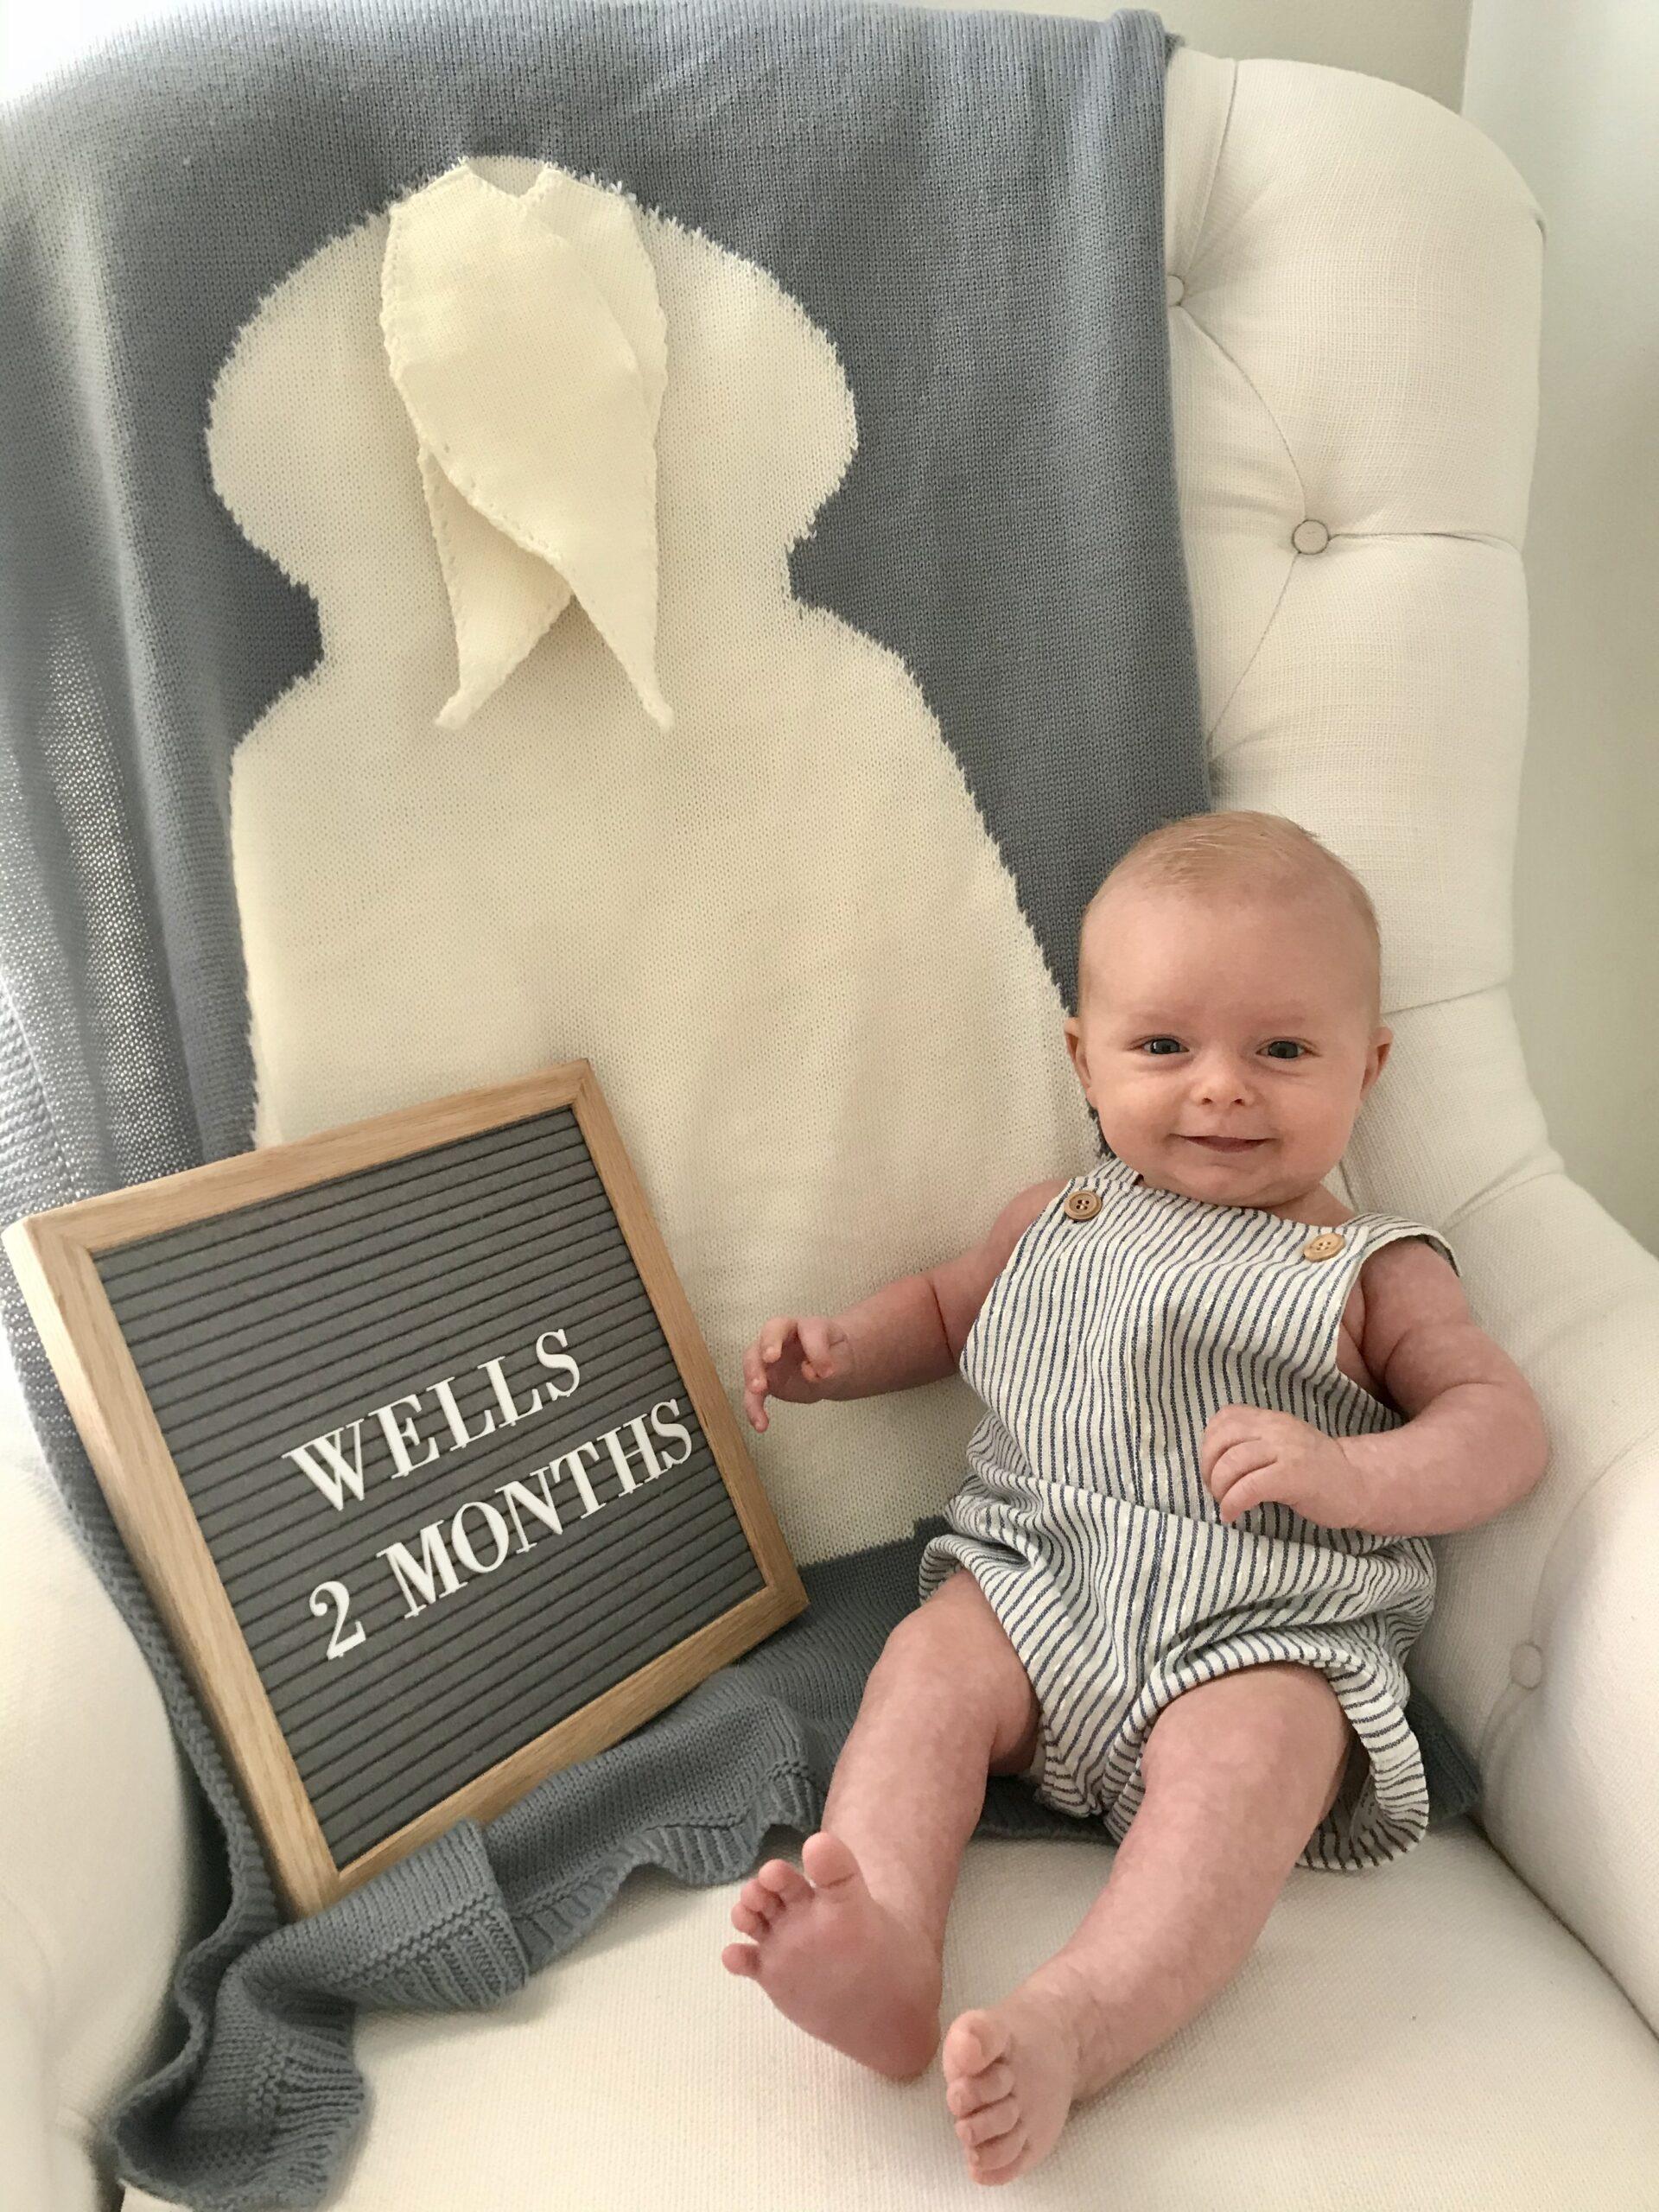 wells 2 months!